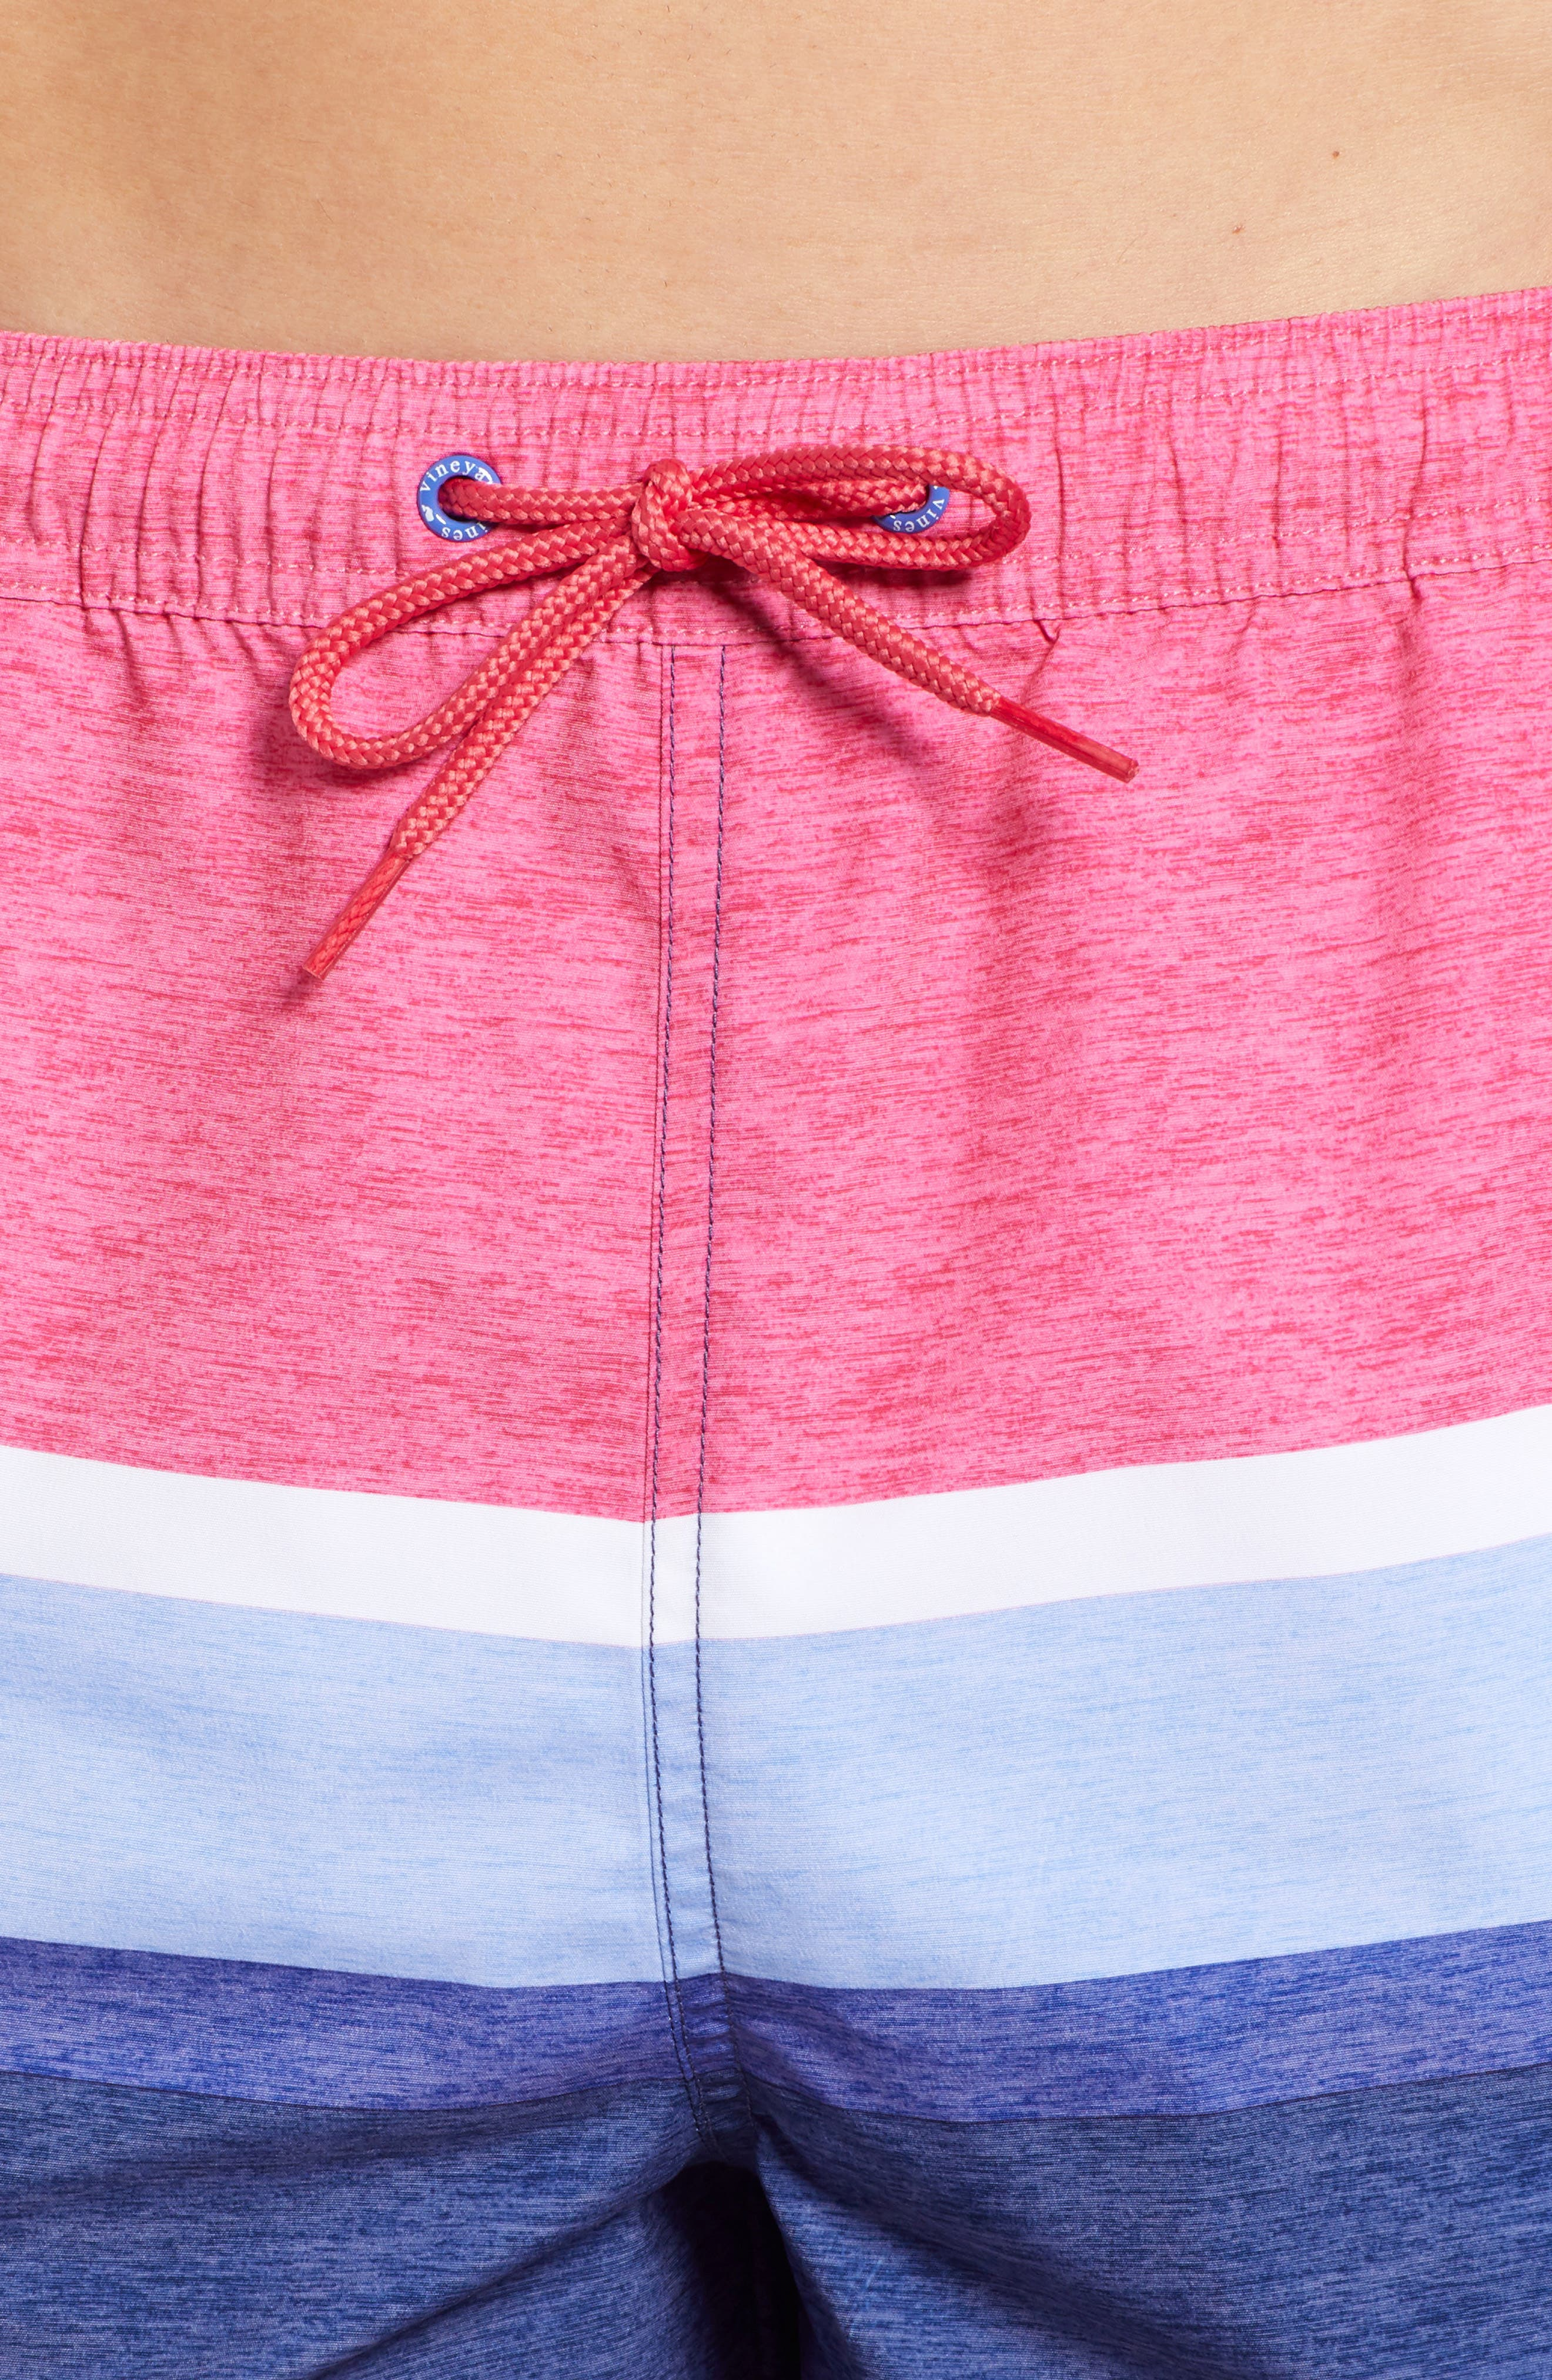 Deck Stripe Chappy Swim Trunks,                             Alternate thumbnail 4, color,                             MARLIN